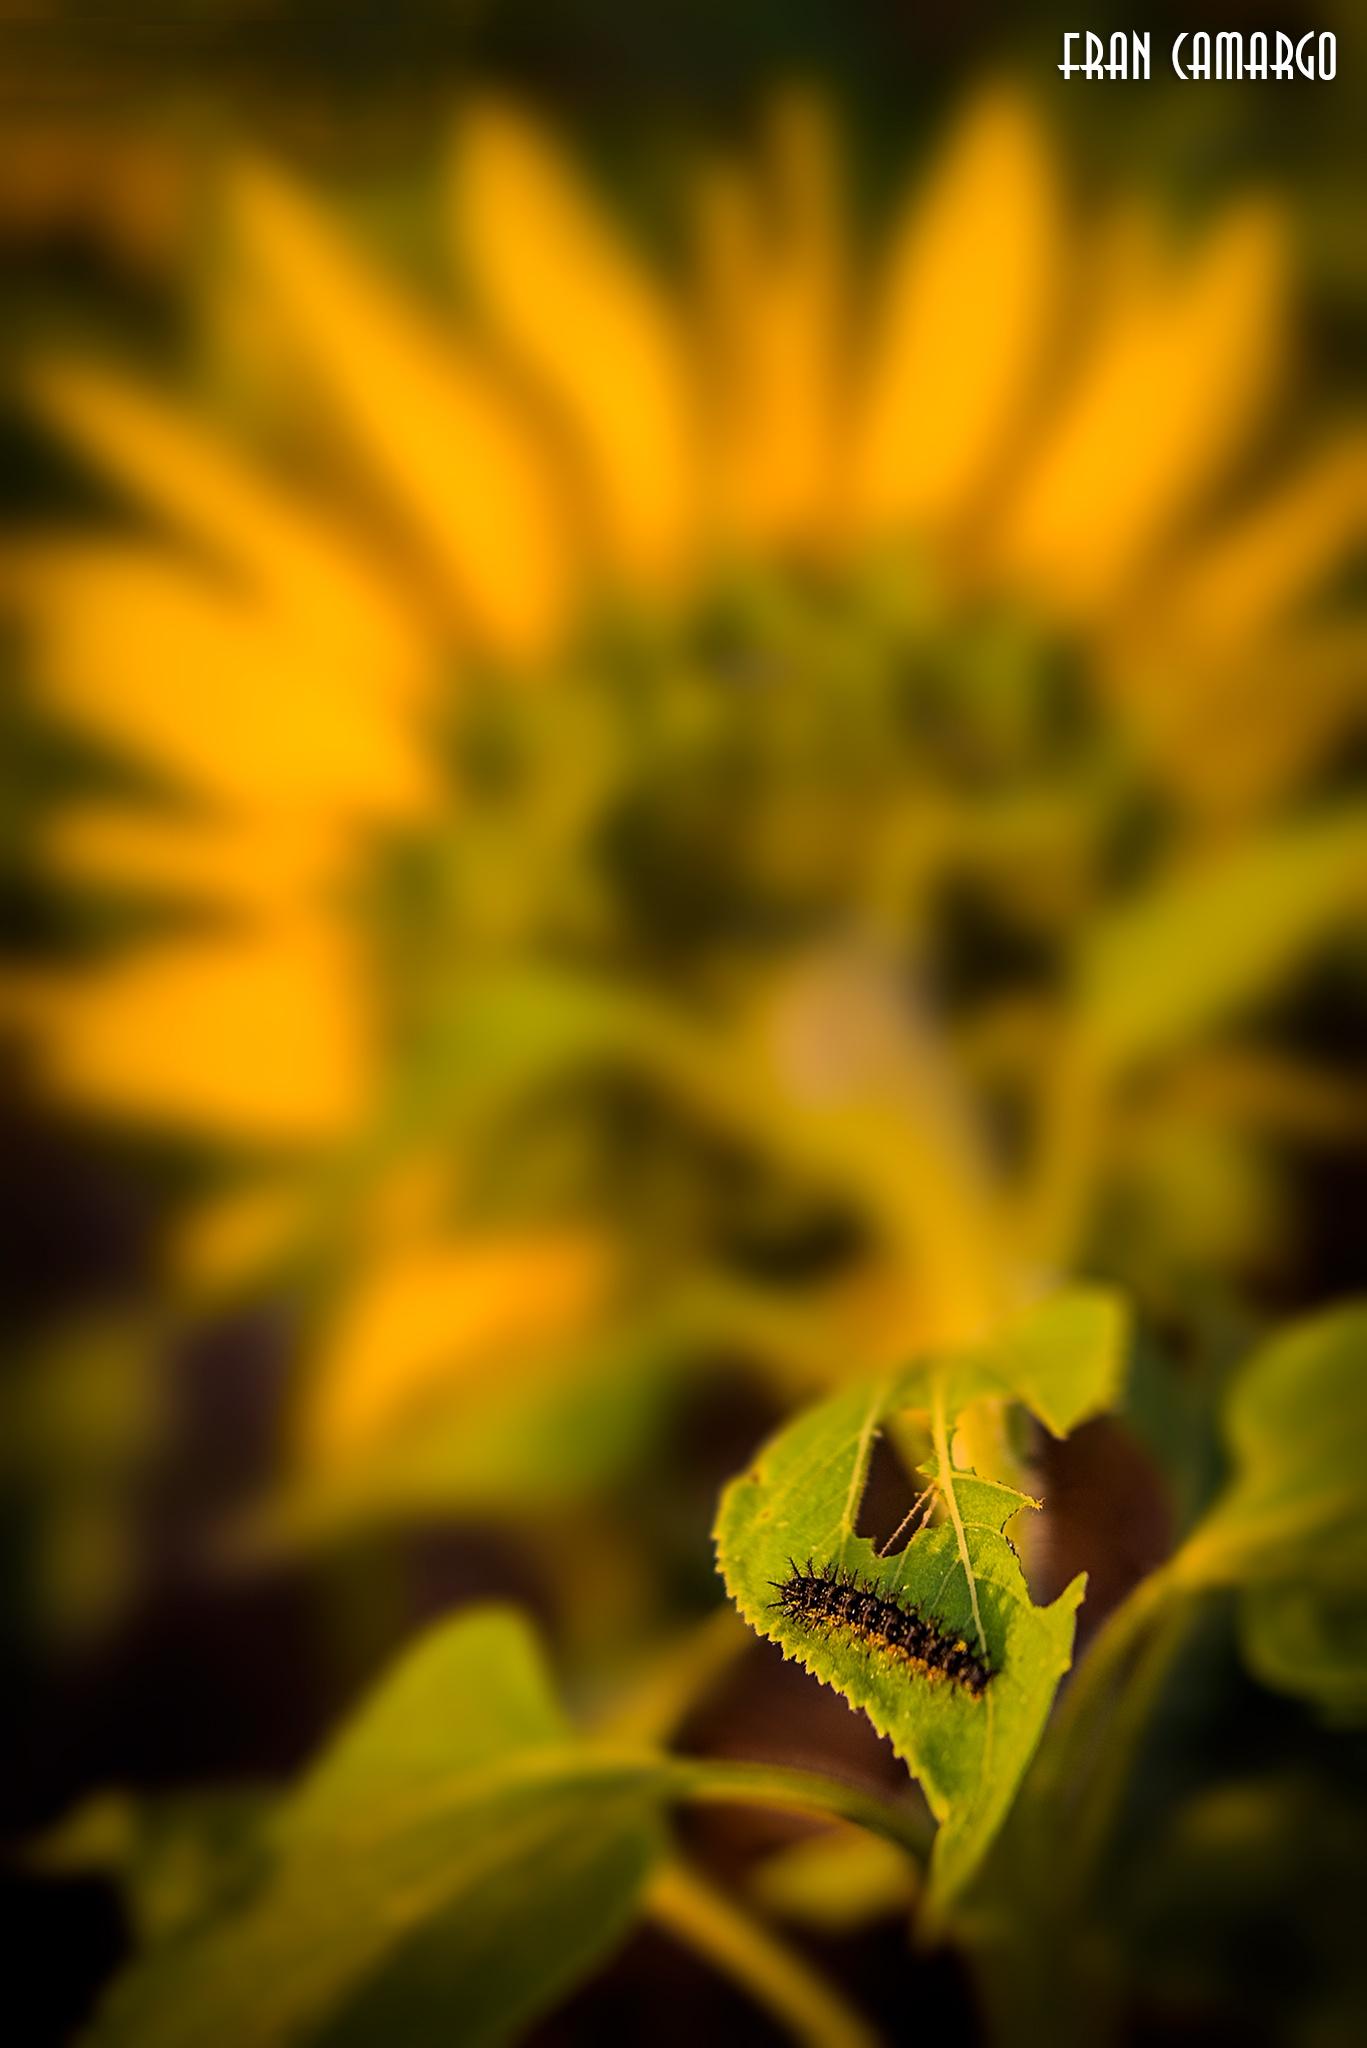 Caterpillar by Fran Camargo